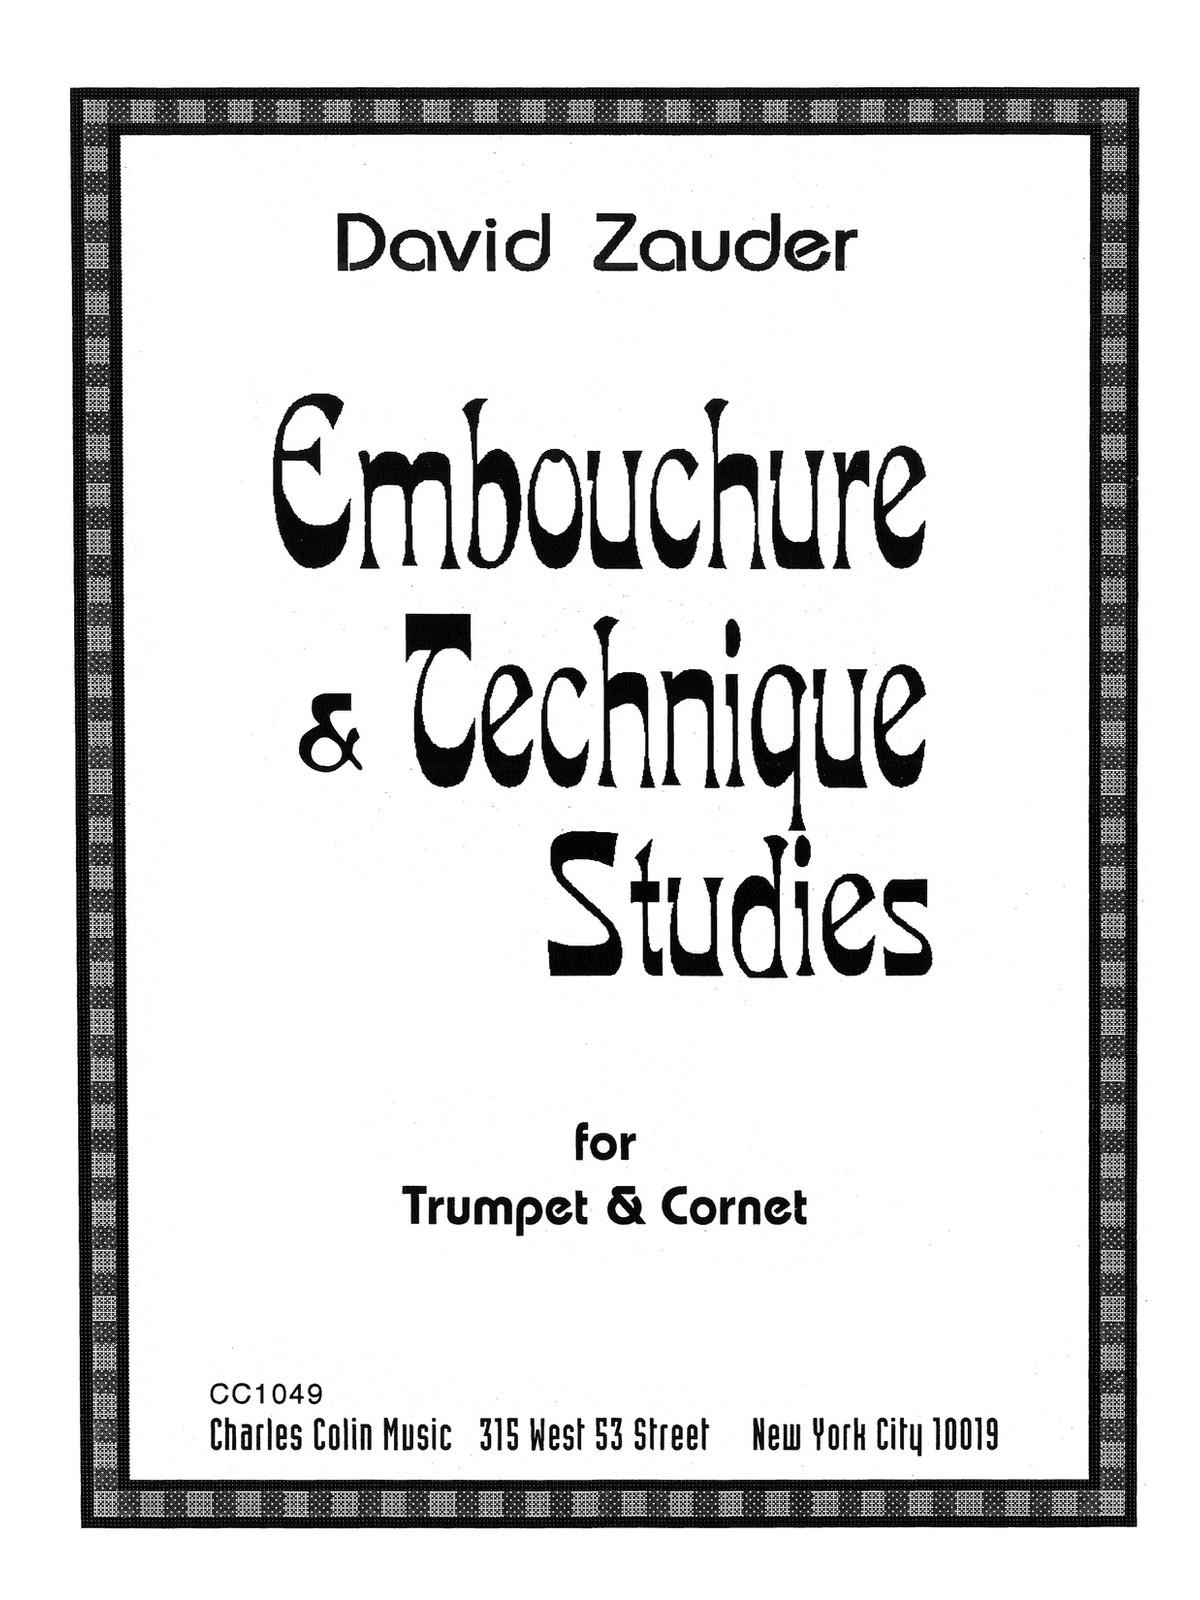 Zauder, Embouchure and Technique Studies